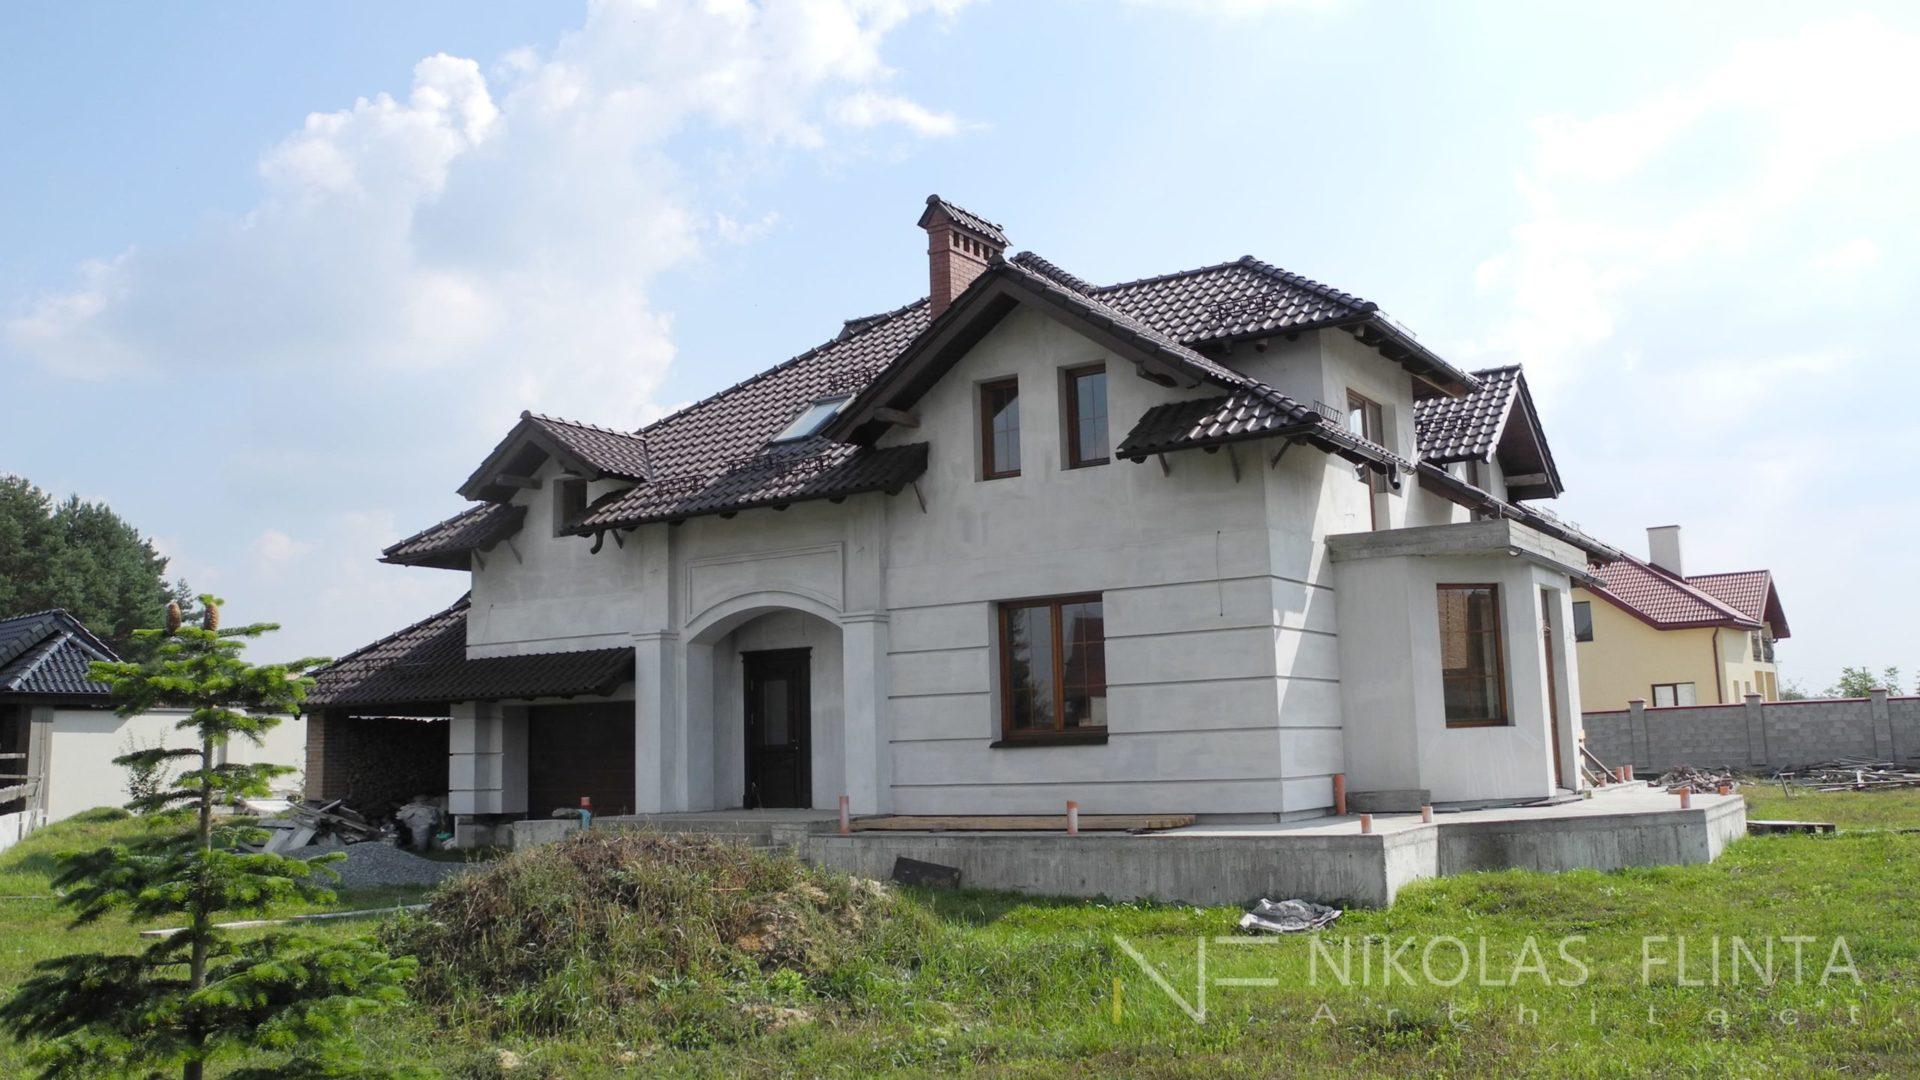 House-06BA_01-1-scaled.jpg